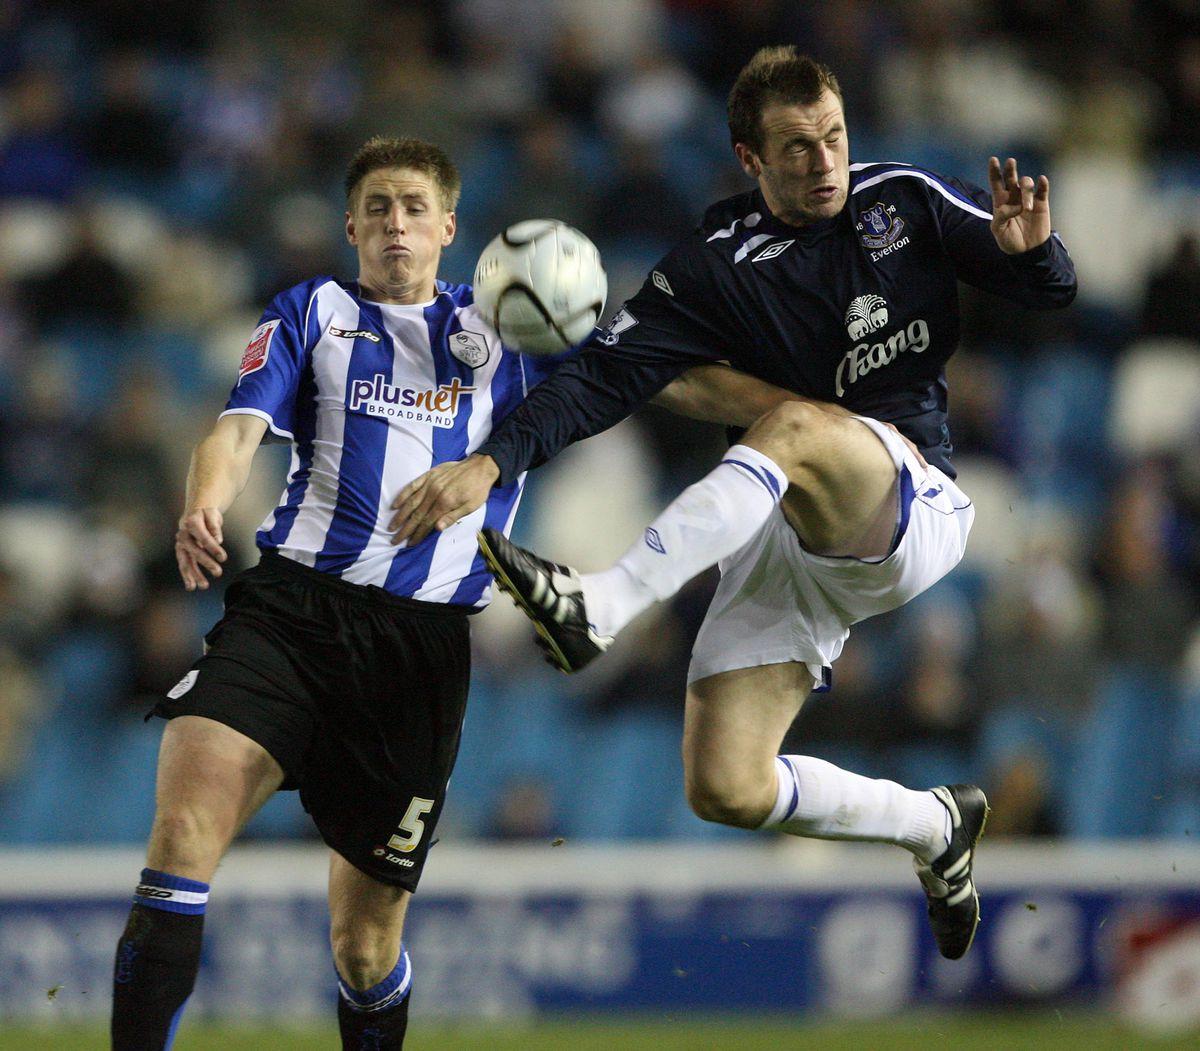 Soccer - Carling Cup - Third Round - Sheffield Wednesday v Everton - Hillsborough